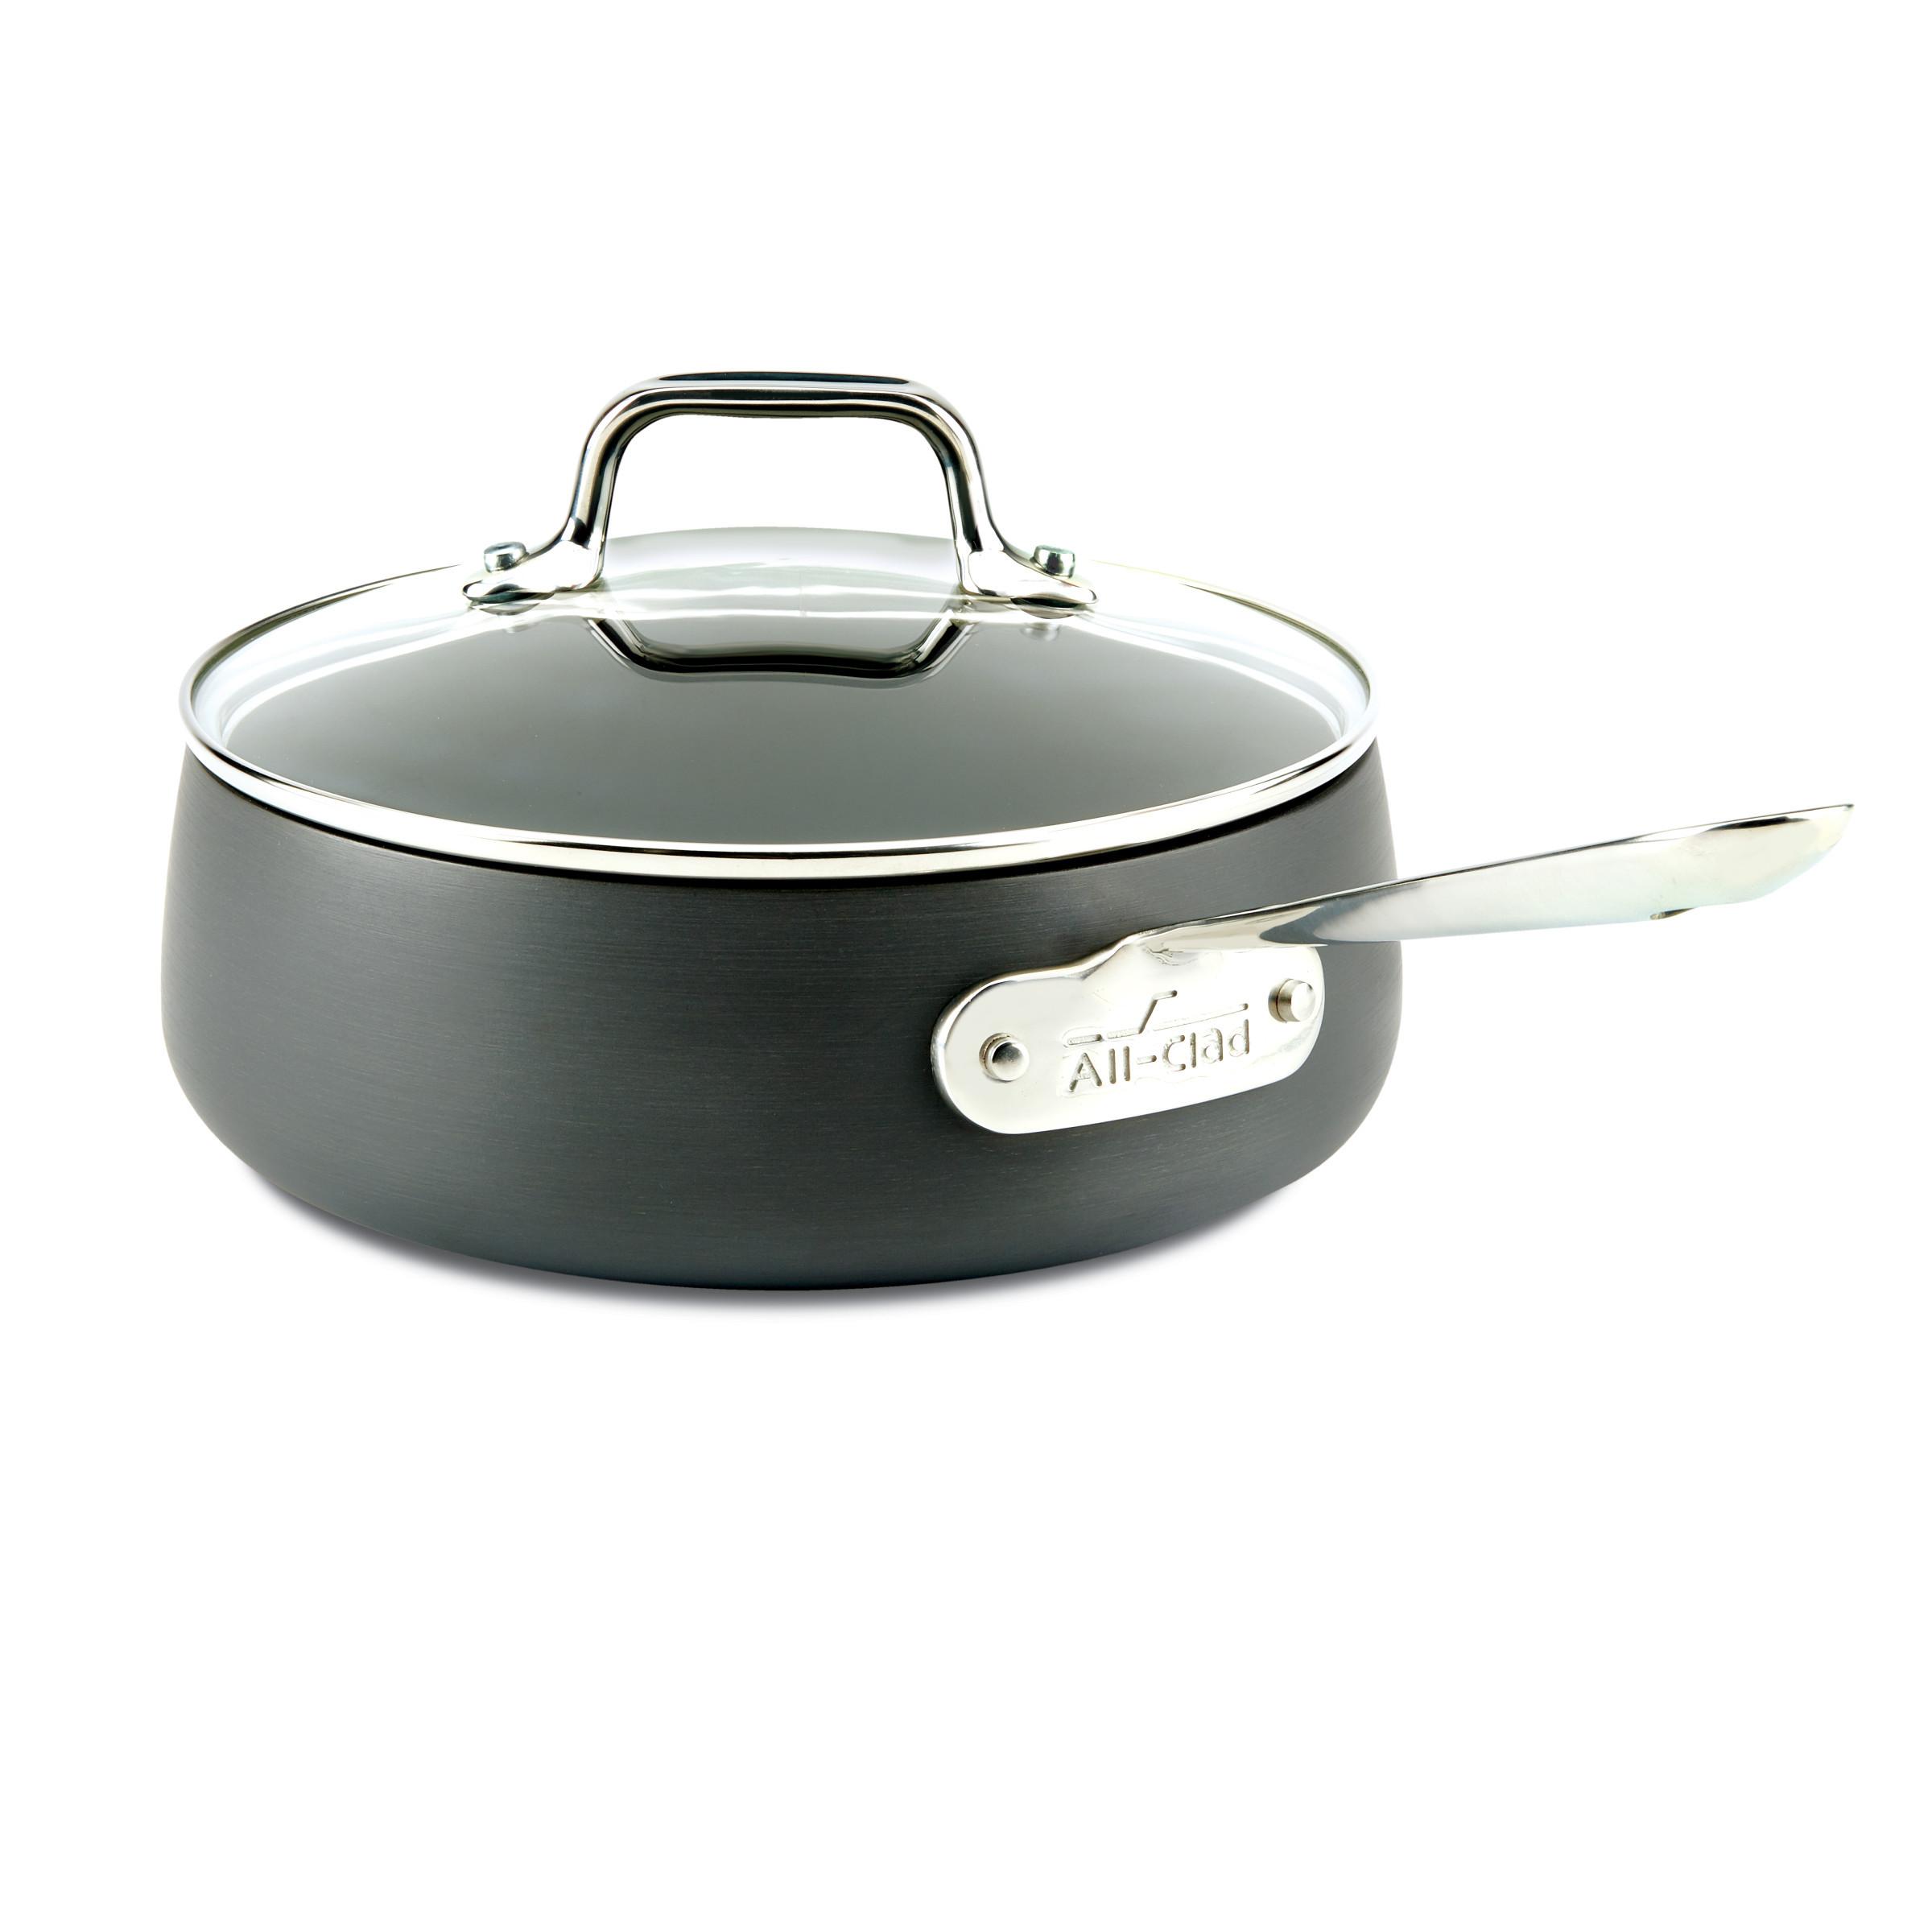 All Clad Hard Anodized Nonstick 2.5 Quart Sauce Pan